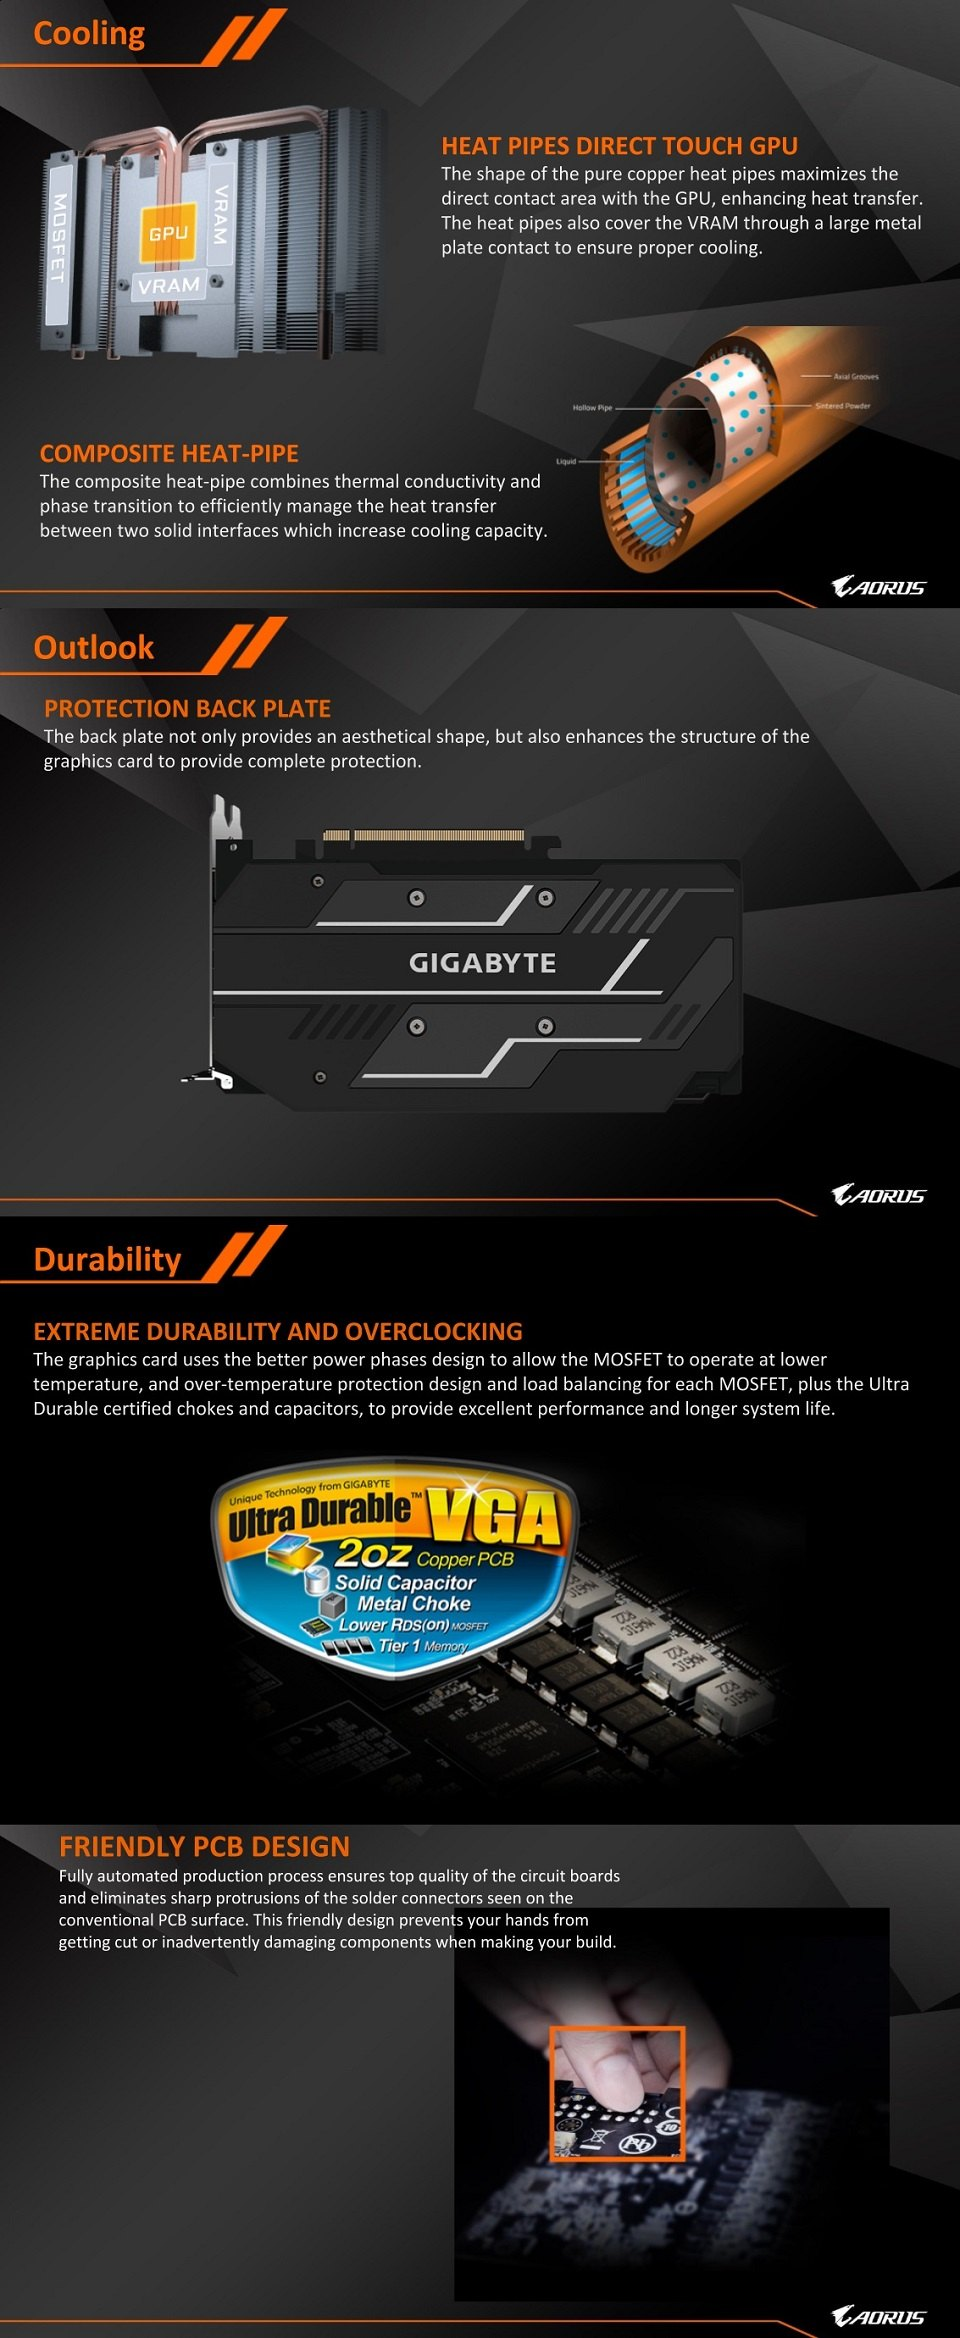 Gigabyte Radeon RX 5500 XT OC 8GB features 2